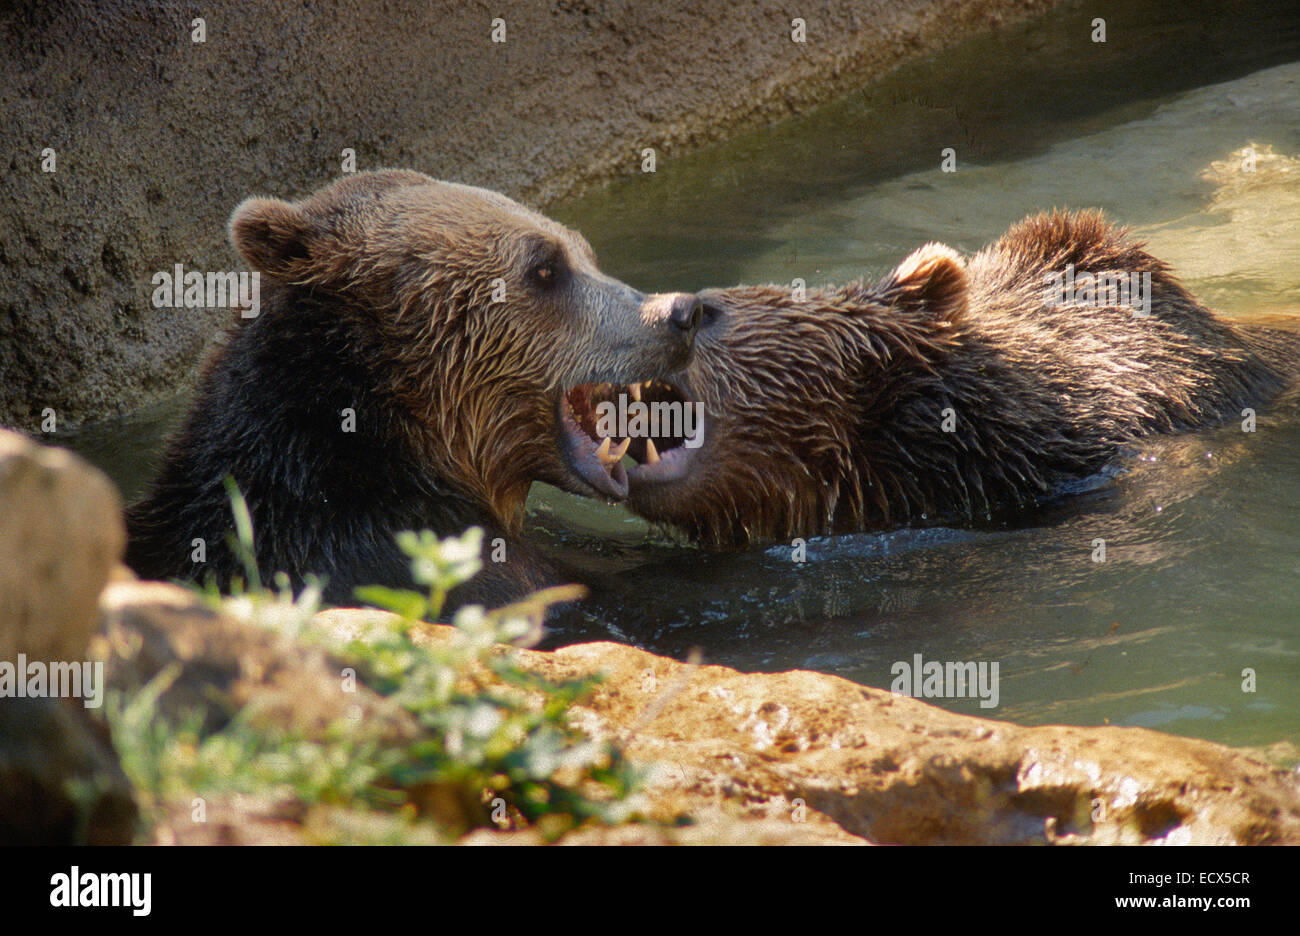 Orso bruno Ursus arctos, Ursidae, il Giardino Zoologico di Roma, Italia Immagini Stock